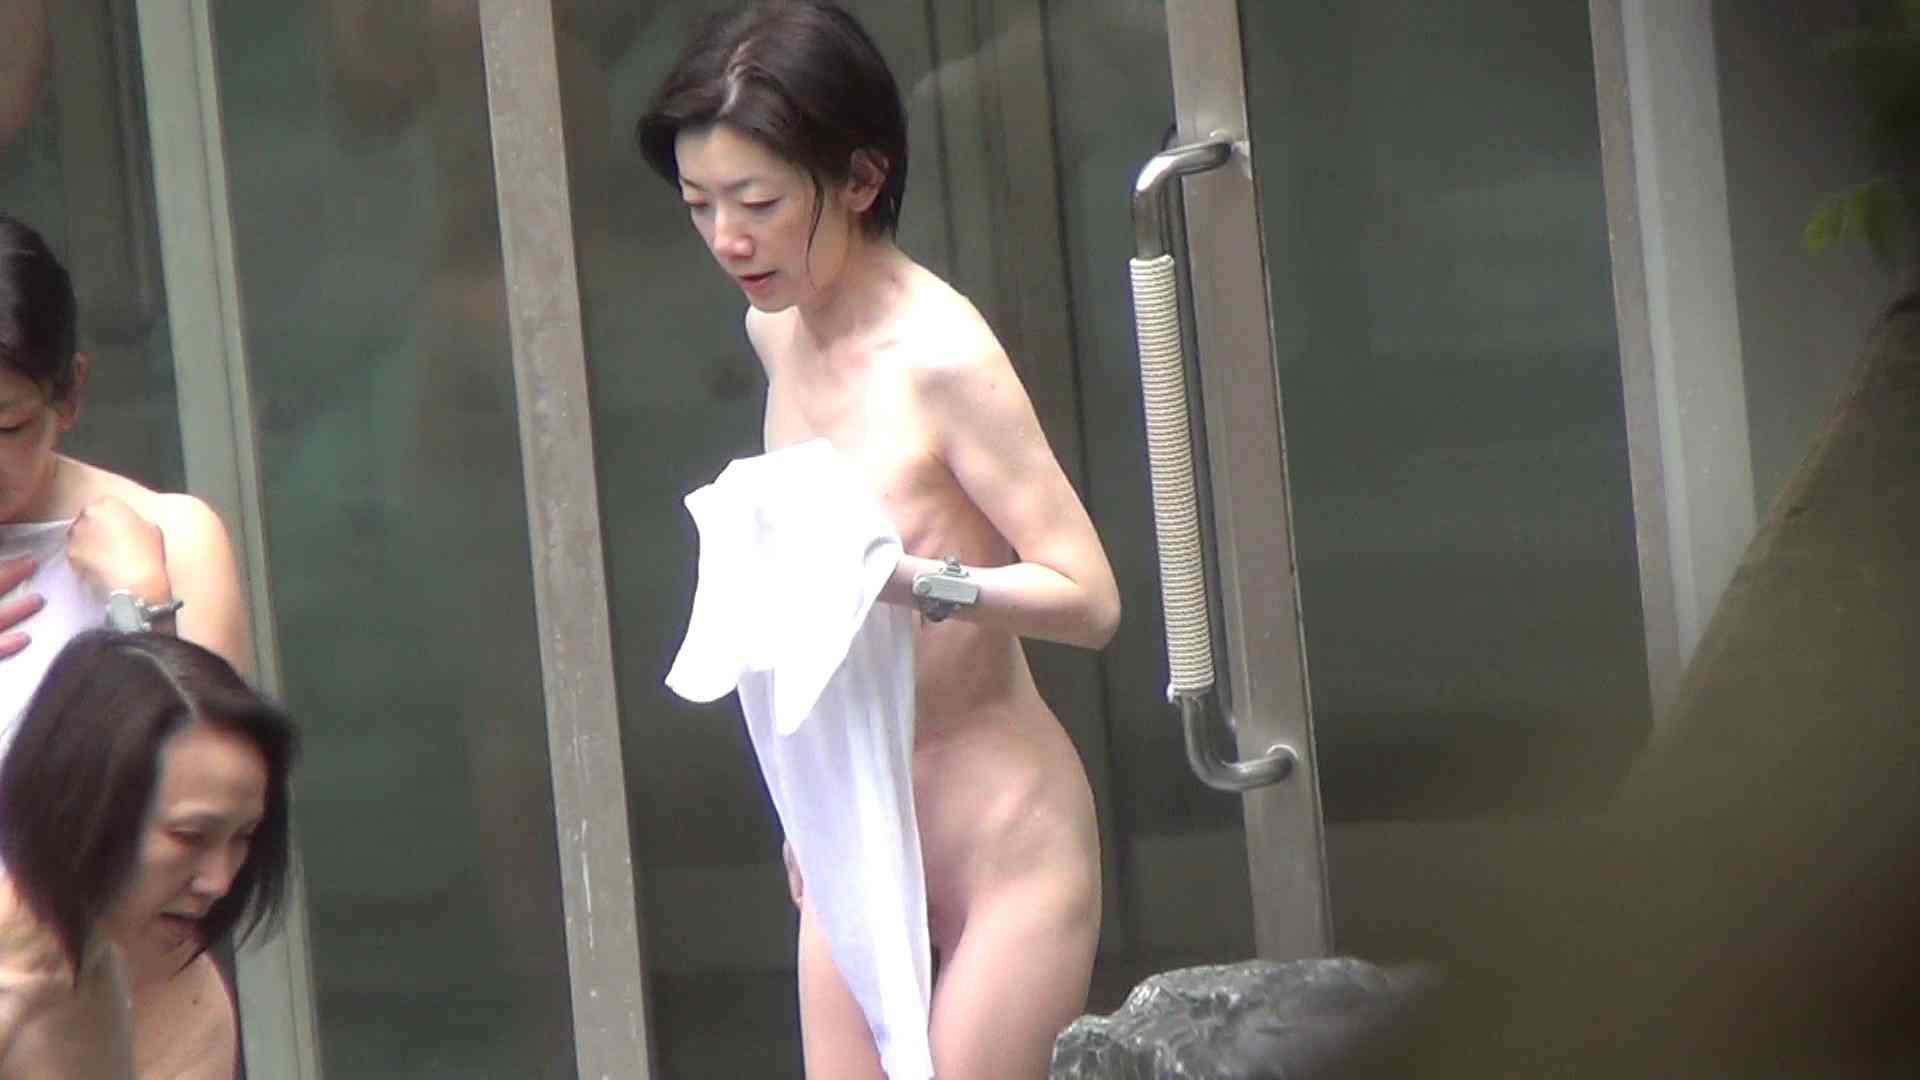 Aquaな露天風呂Vol.240 エッチな盗撮 AV無料動画キャプチャ 79pic 48